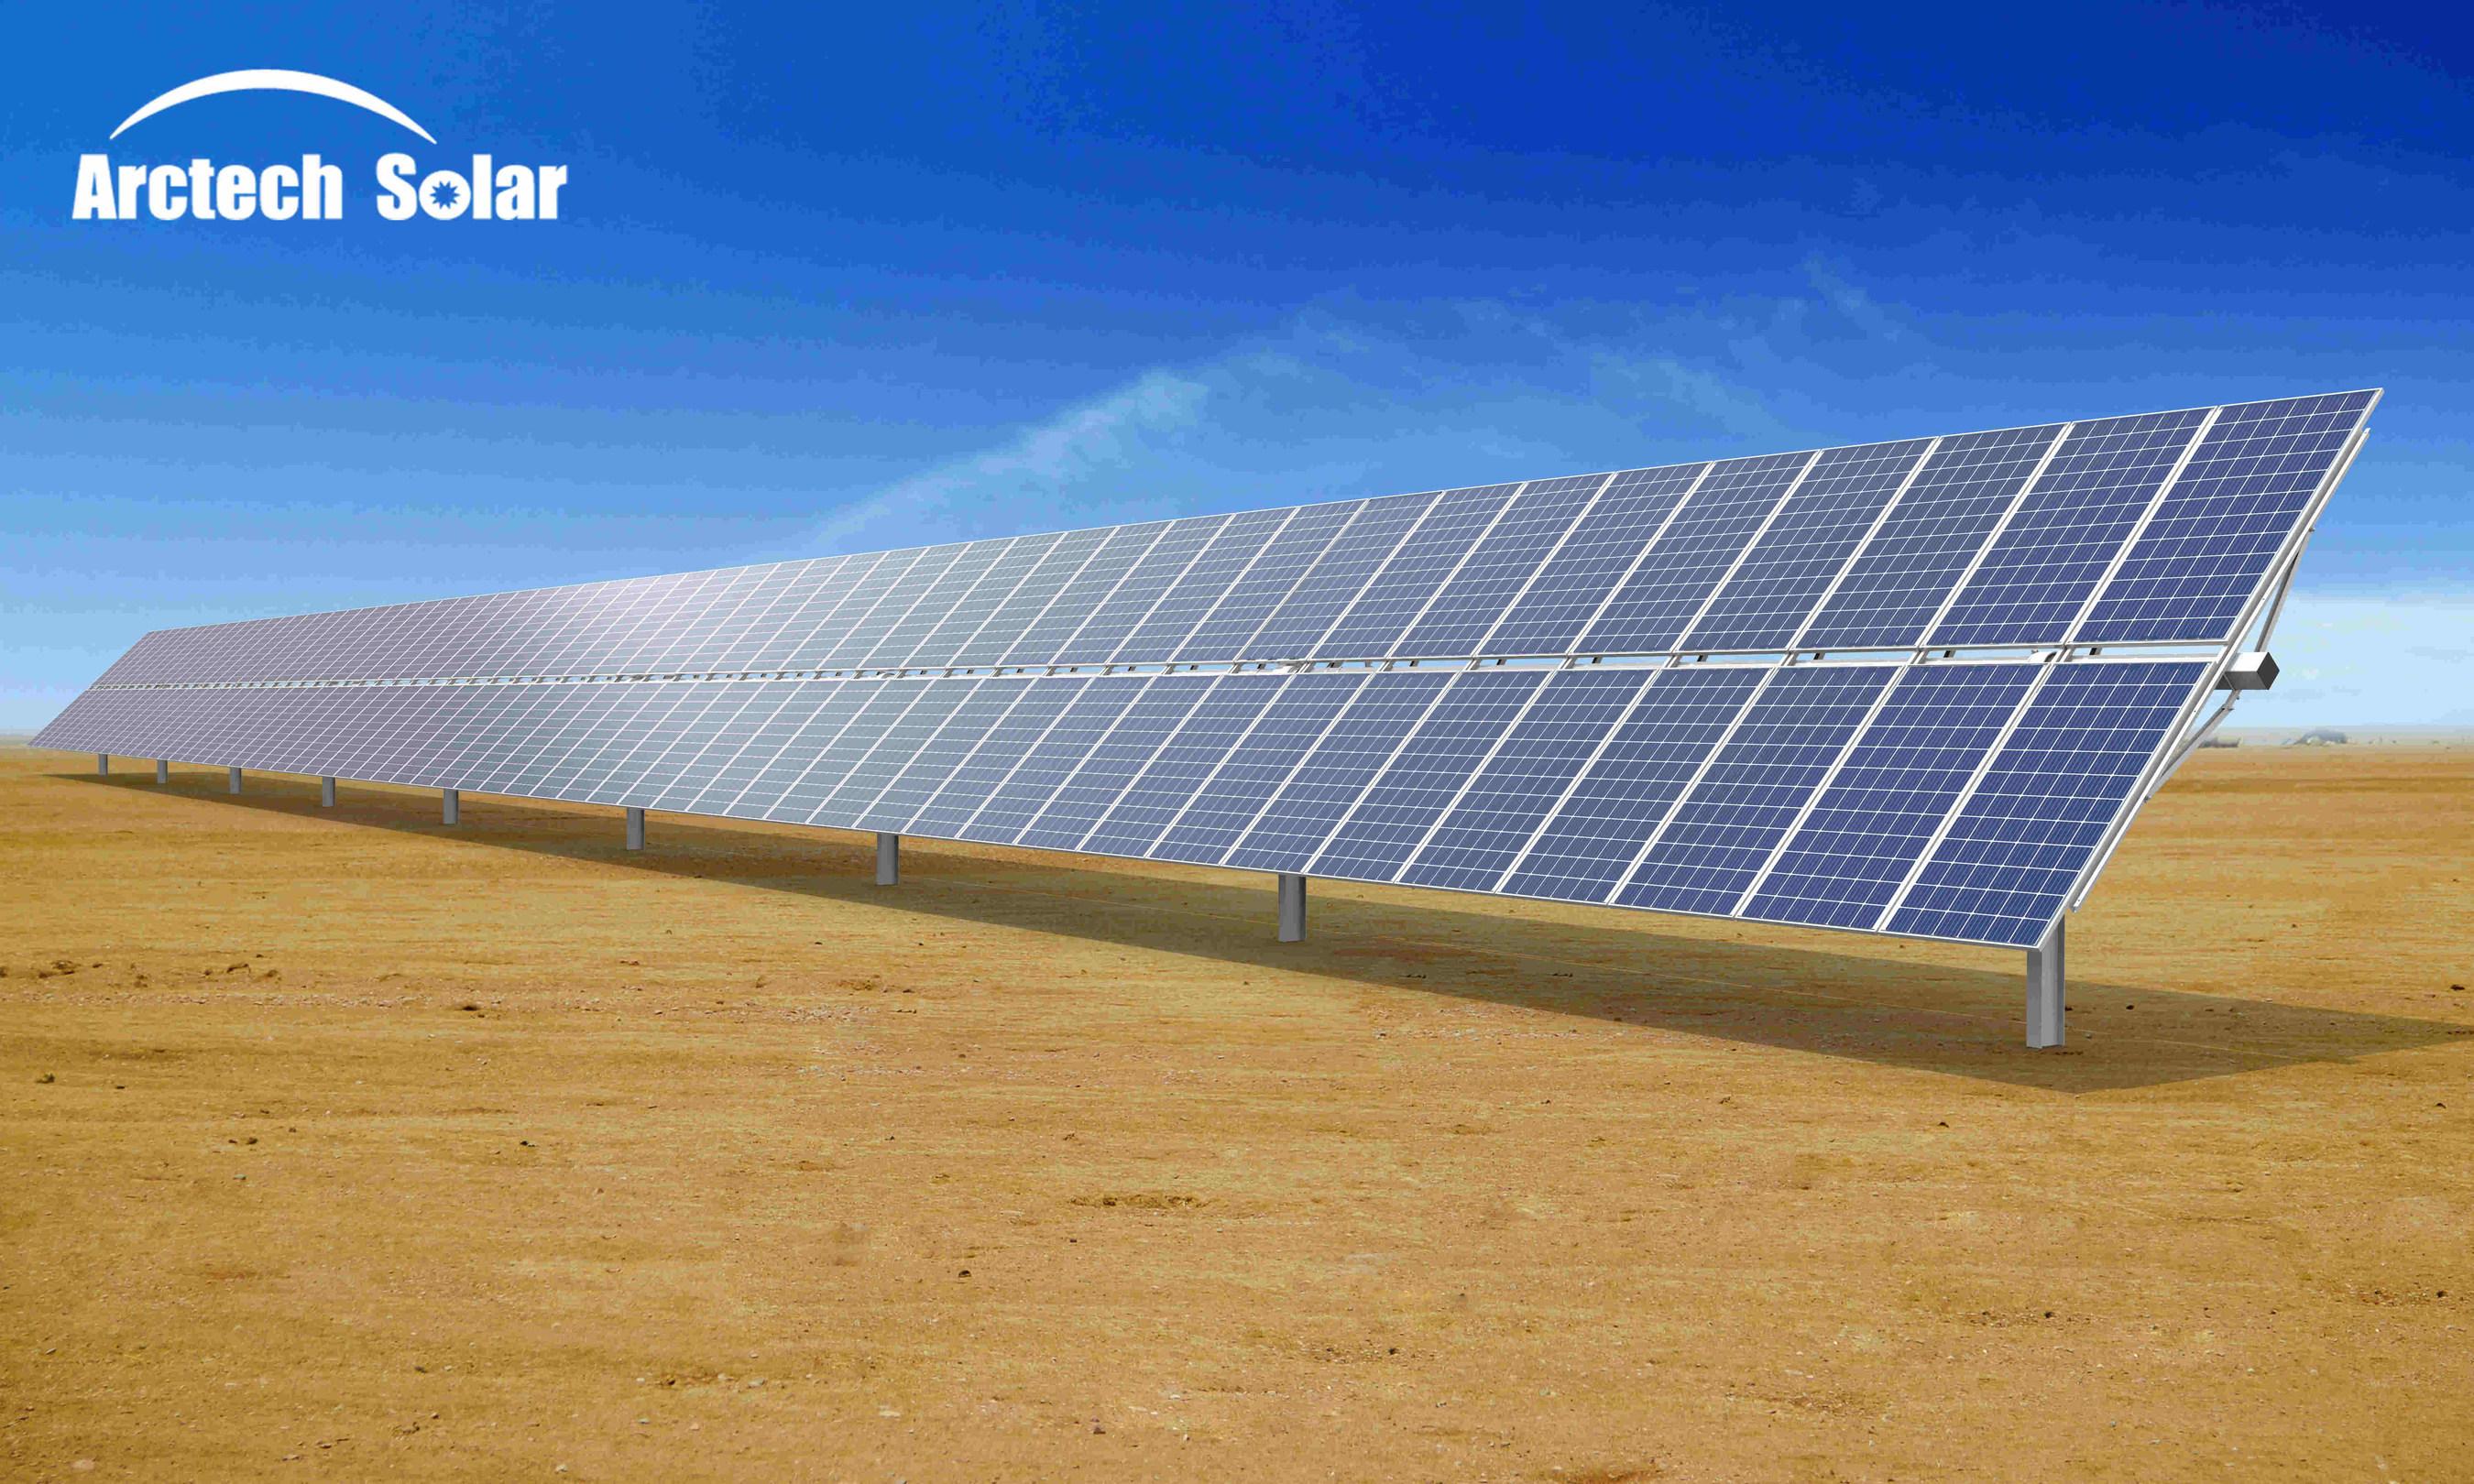 Arctech Launches 120-Module 2P Solar Tracker in Industry First Move (PRNewsfoto/Arctech Solar)